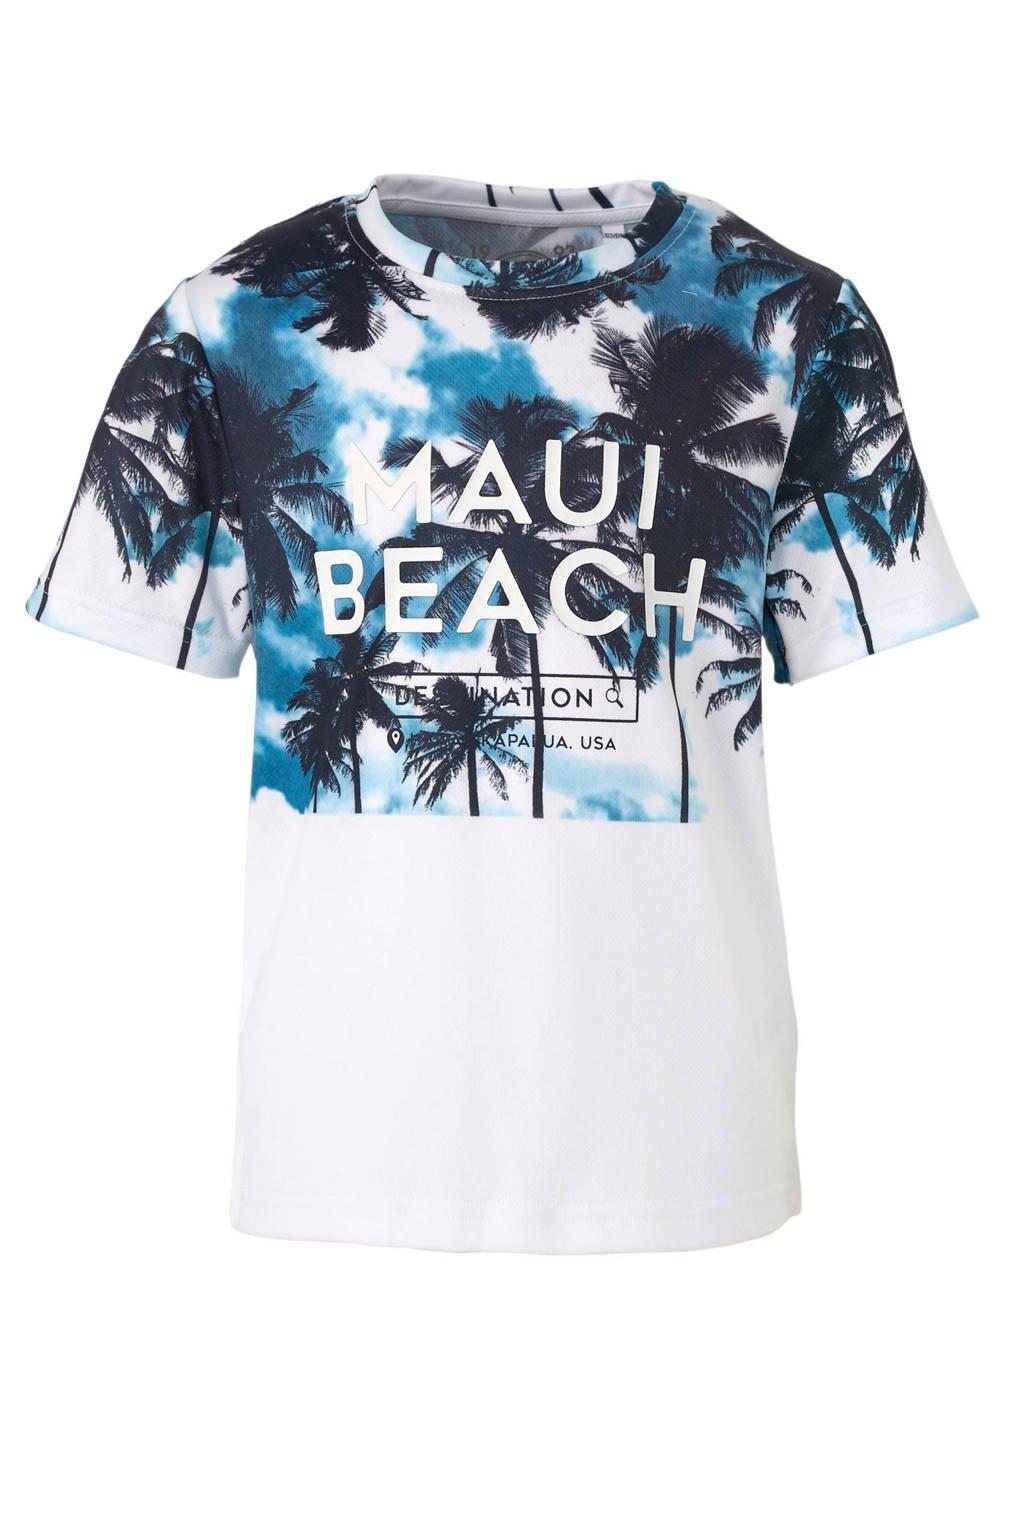 C&A Here & There T-shirt met palmbomen blauw, Blauw/wit